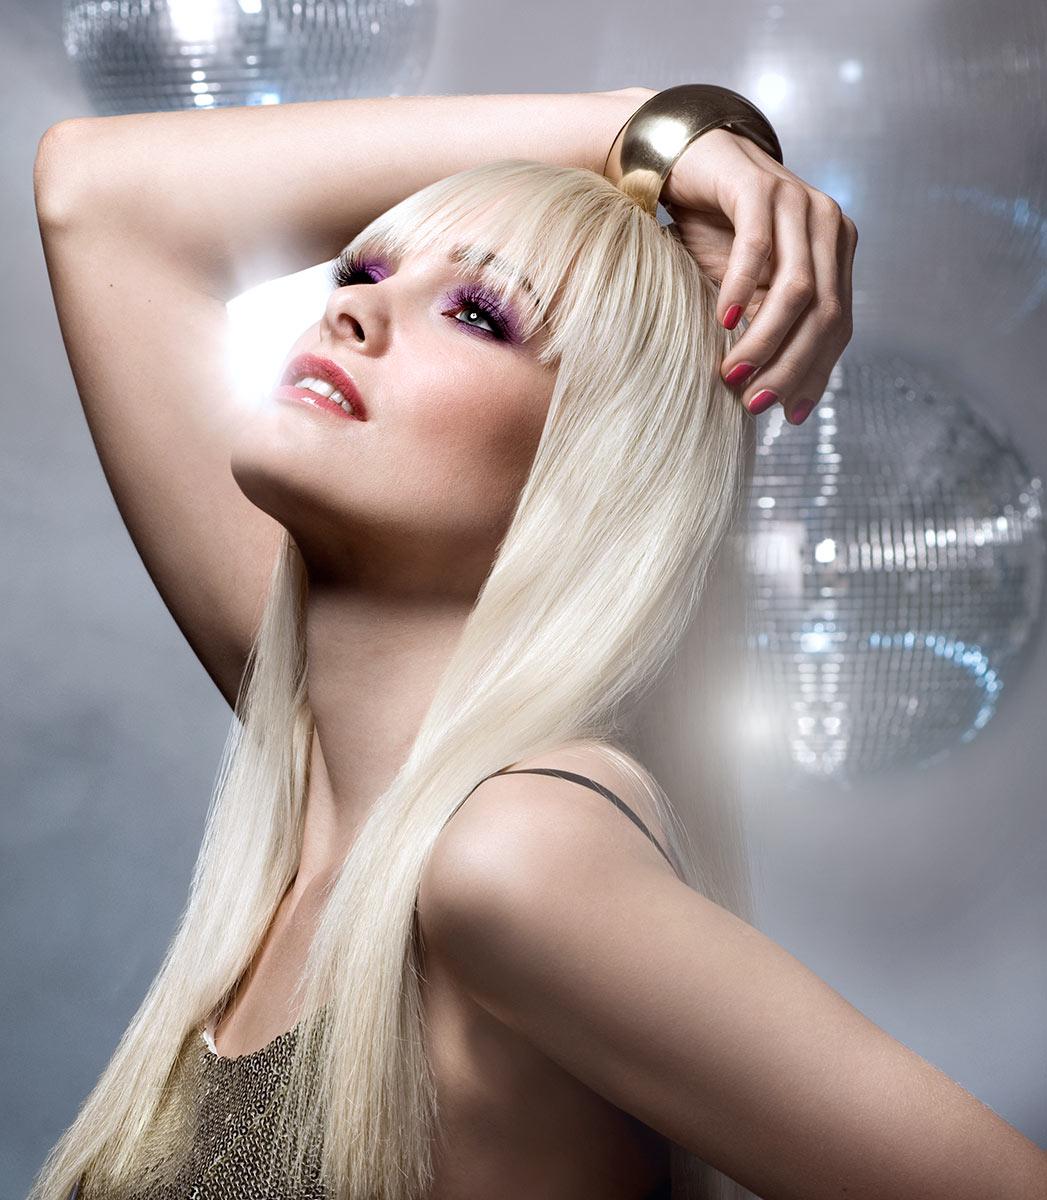 Beautyfotografie für Rimmel London. Model tanz im Club vor Discokugel. |Felix Krammer Fotografie